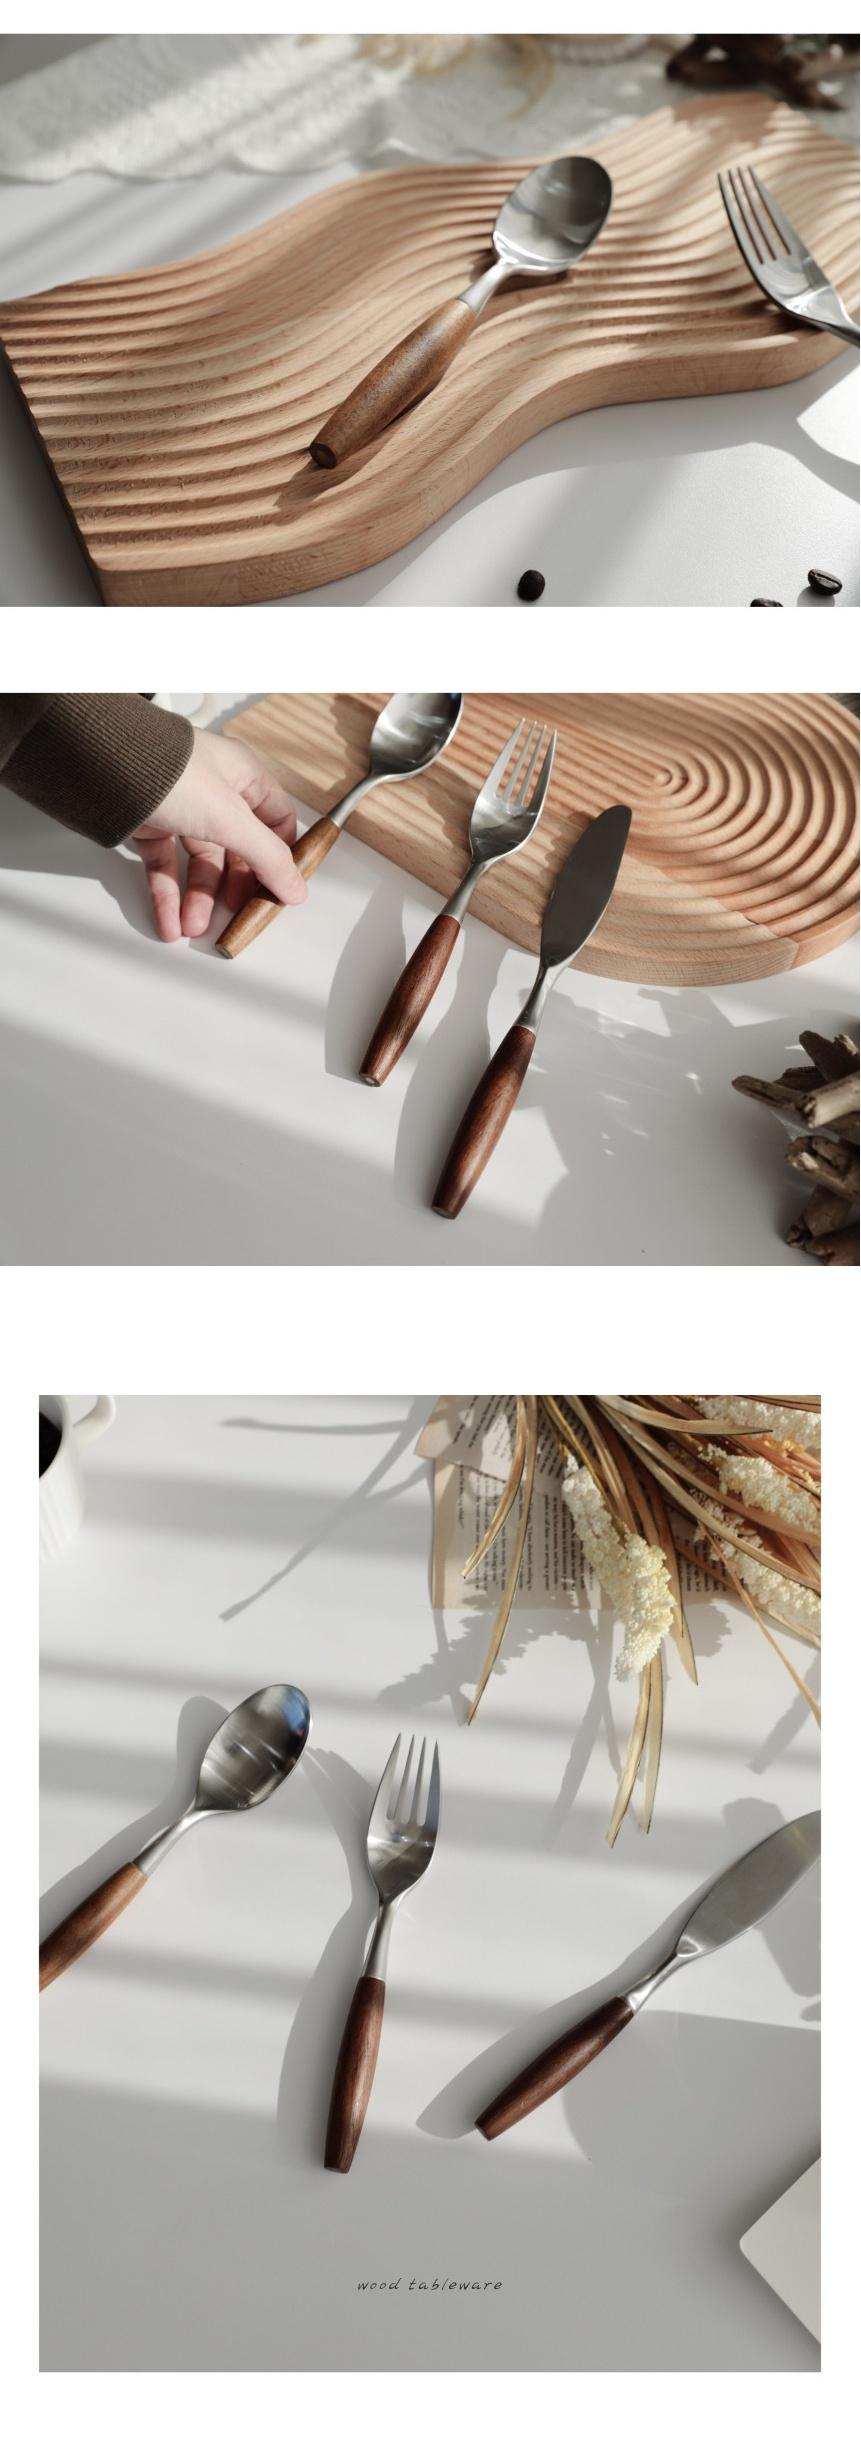 wood_handle_cutterary_03.jpg